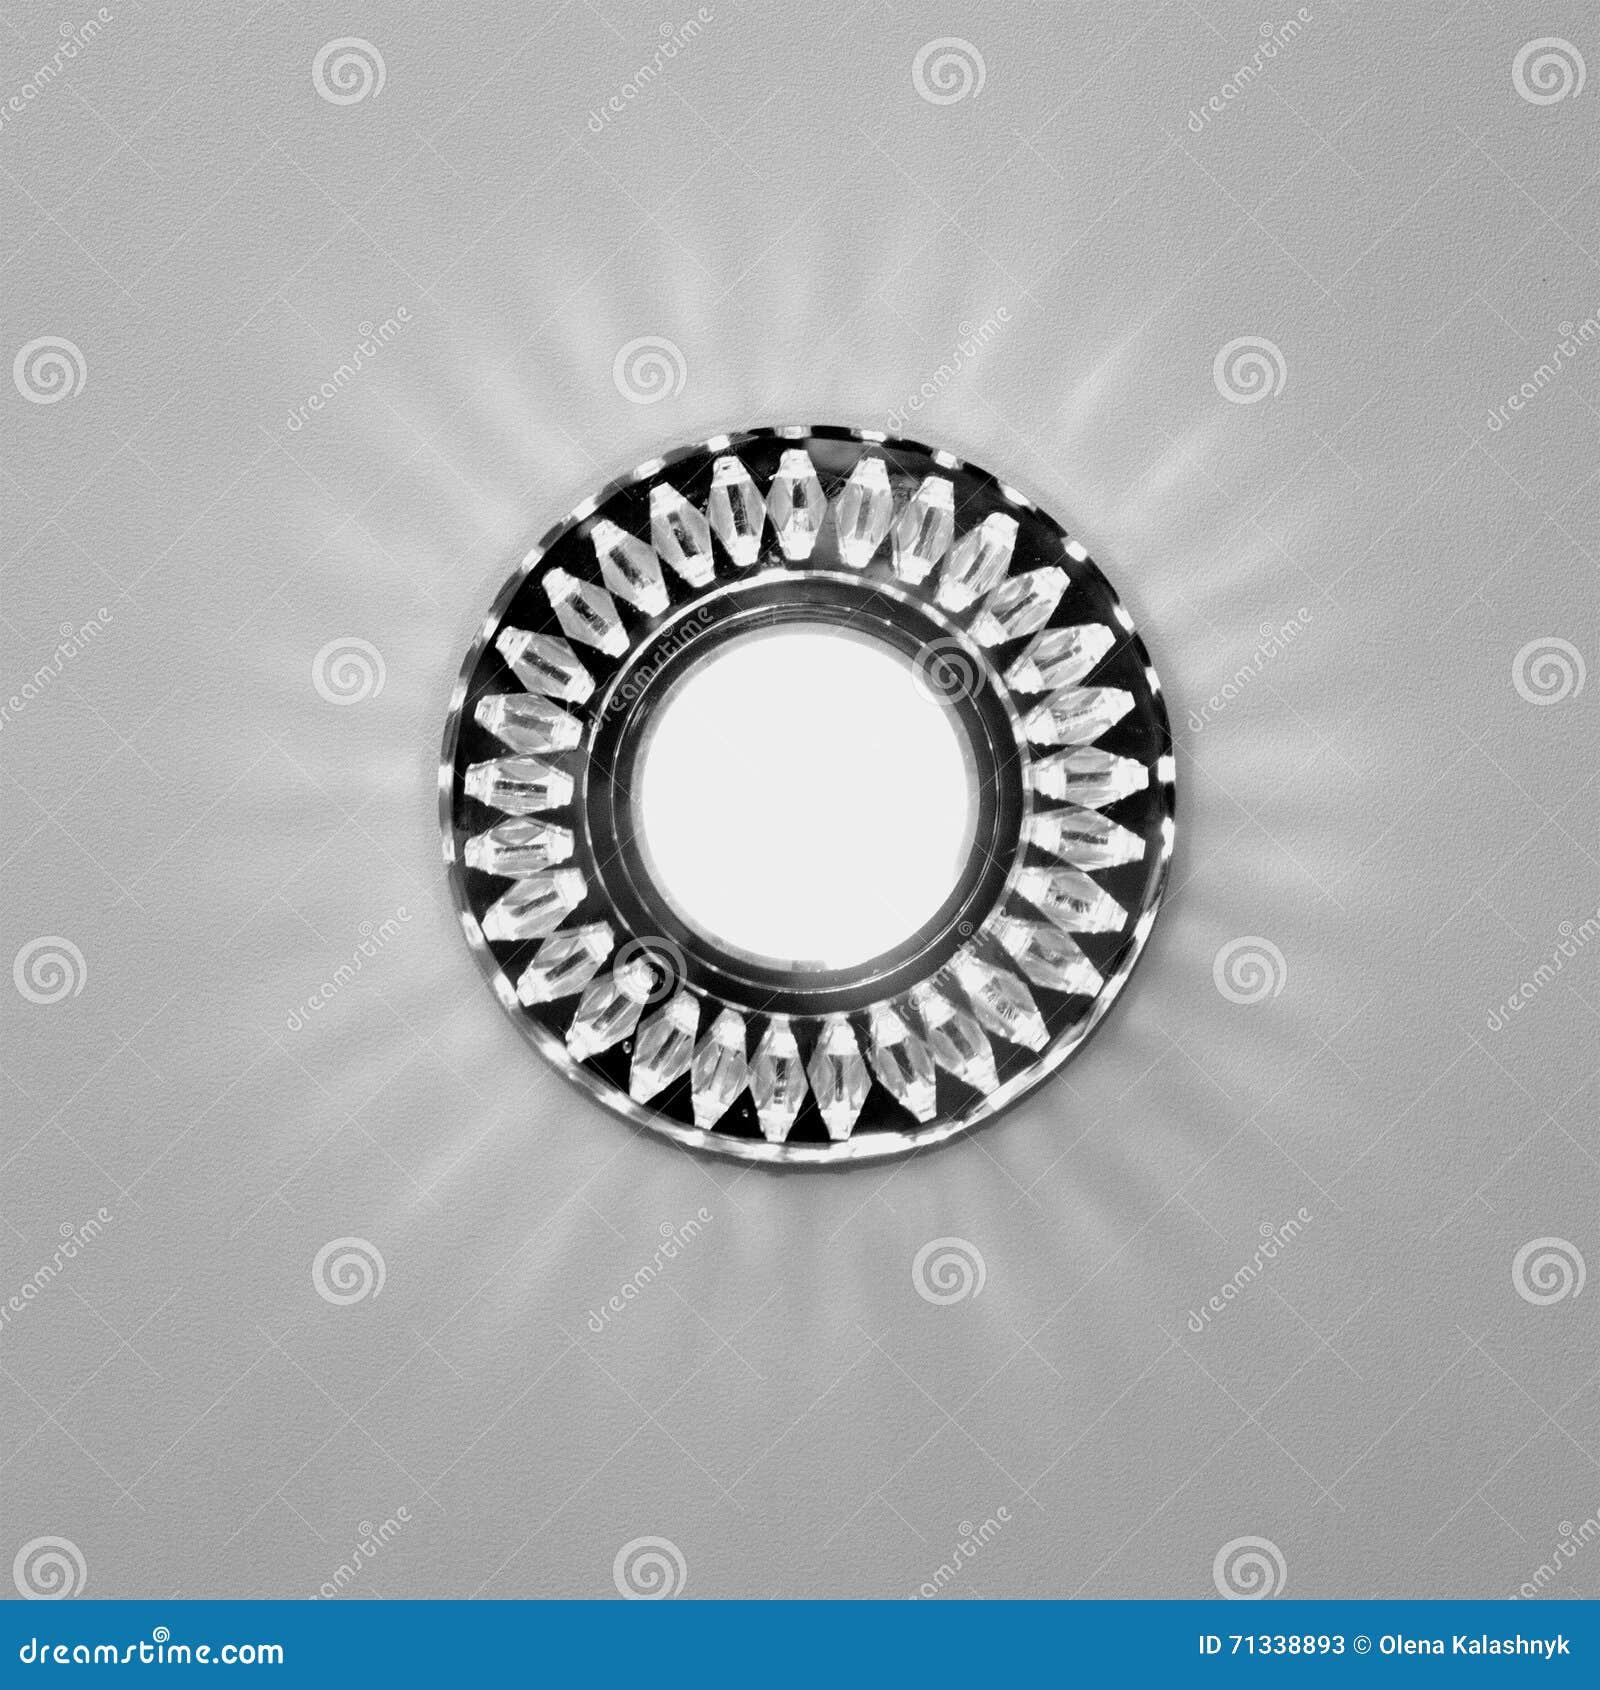 Bright Circular Lamp On The Ceiling Stock Image Image Of Beautiful Lamp 71338893